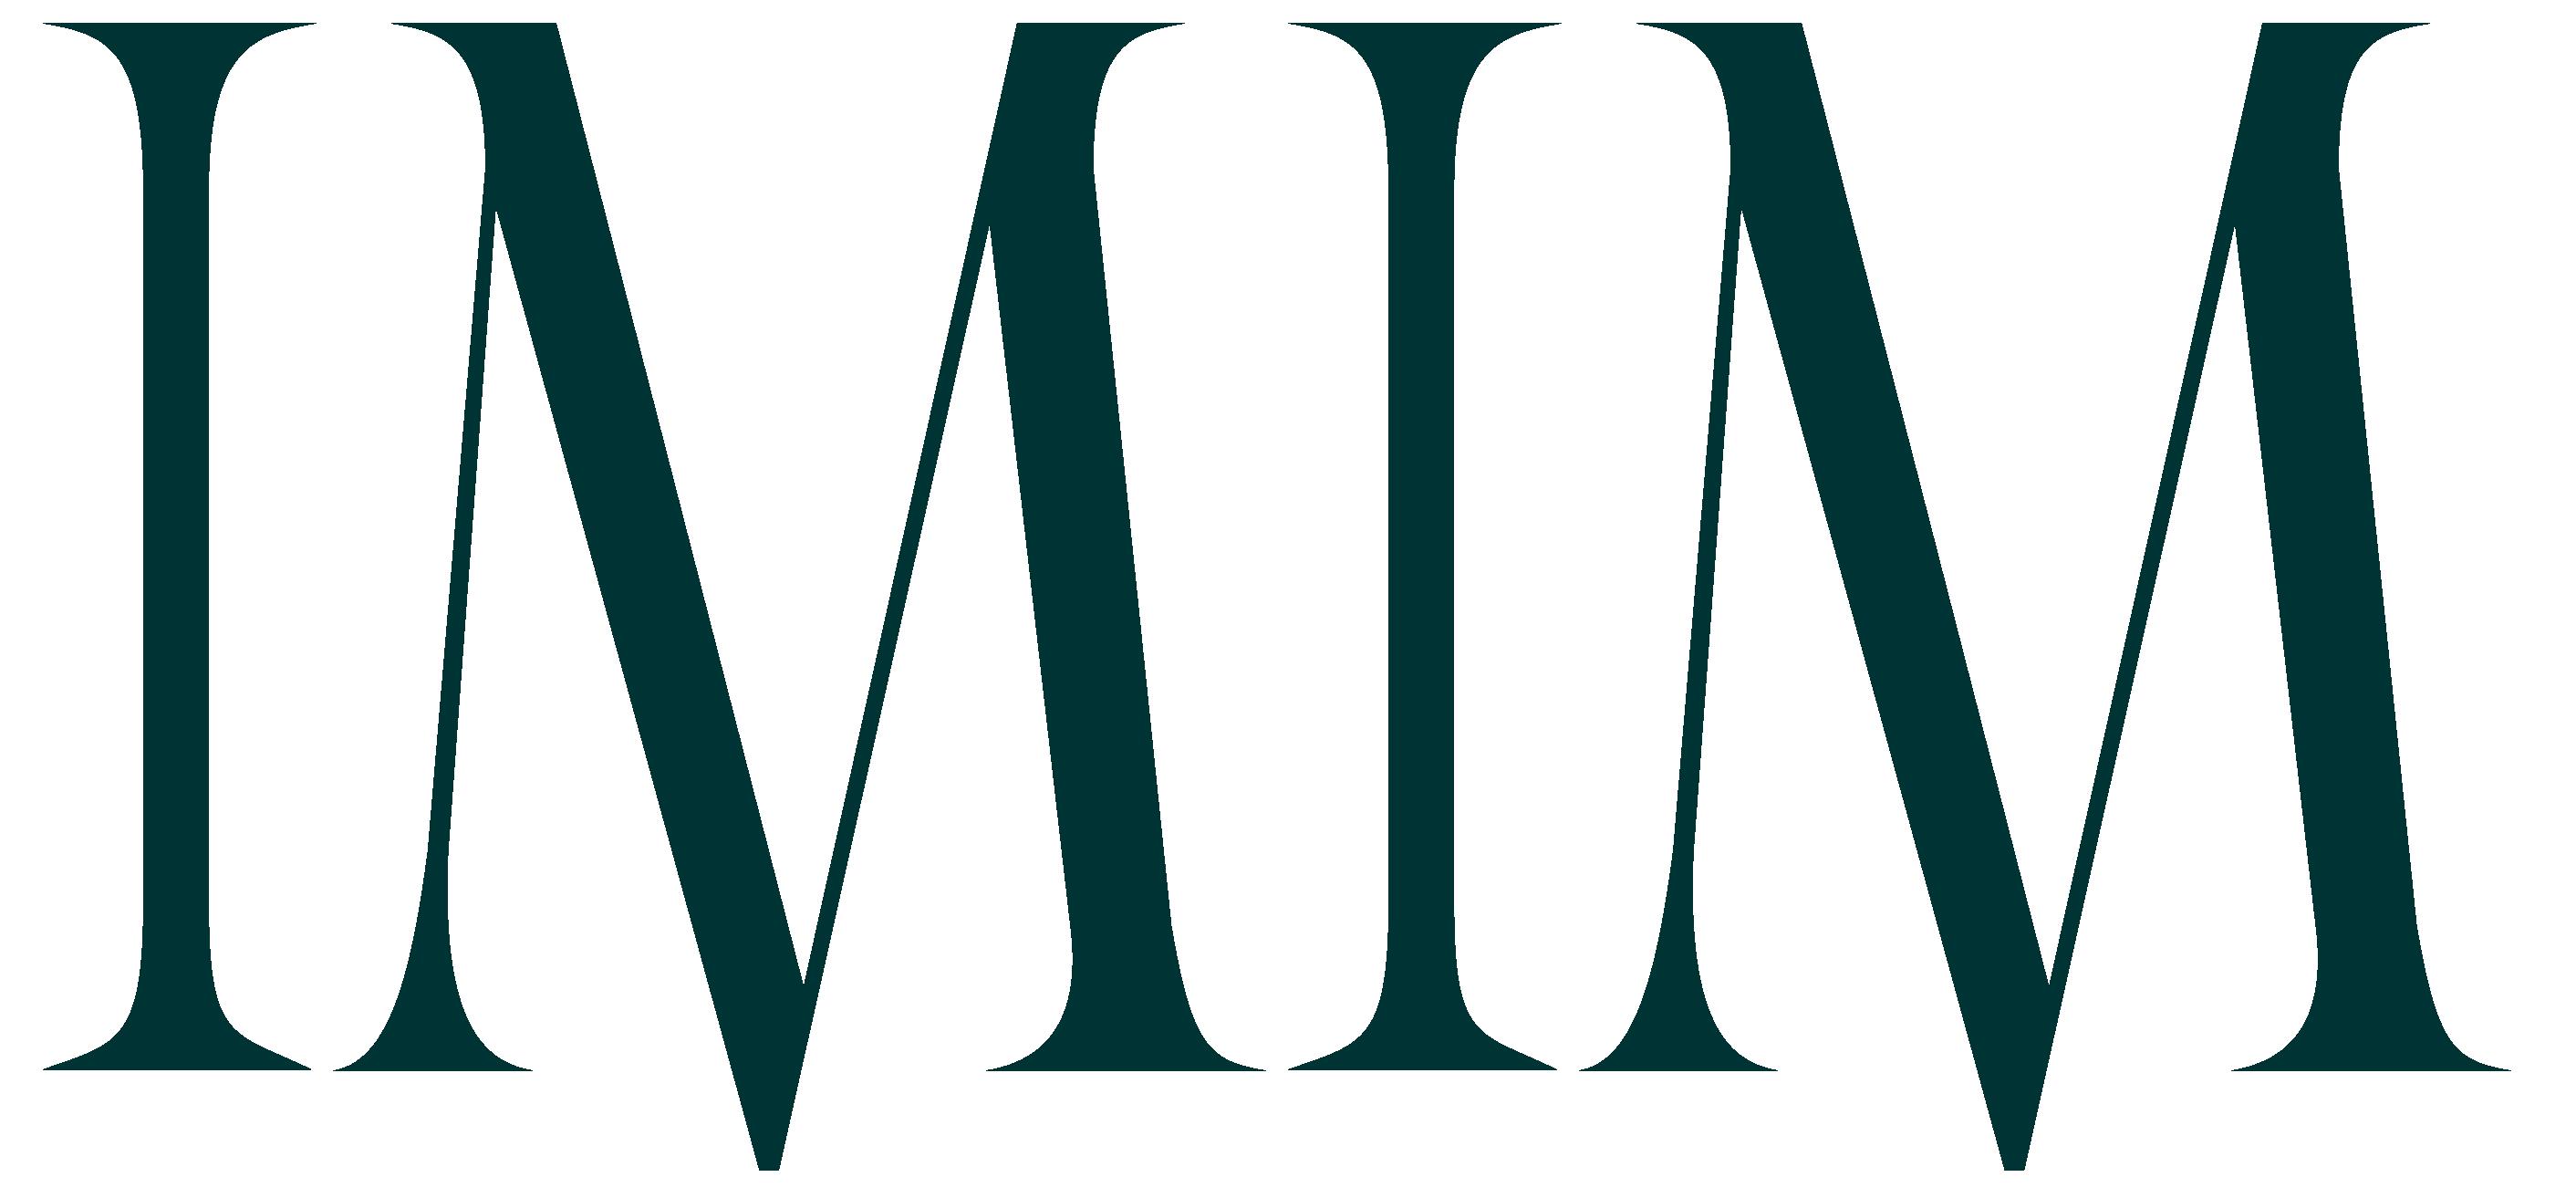 IMIM WEB DESIGN AND DIGITAL MARKETING